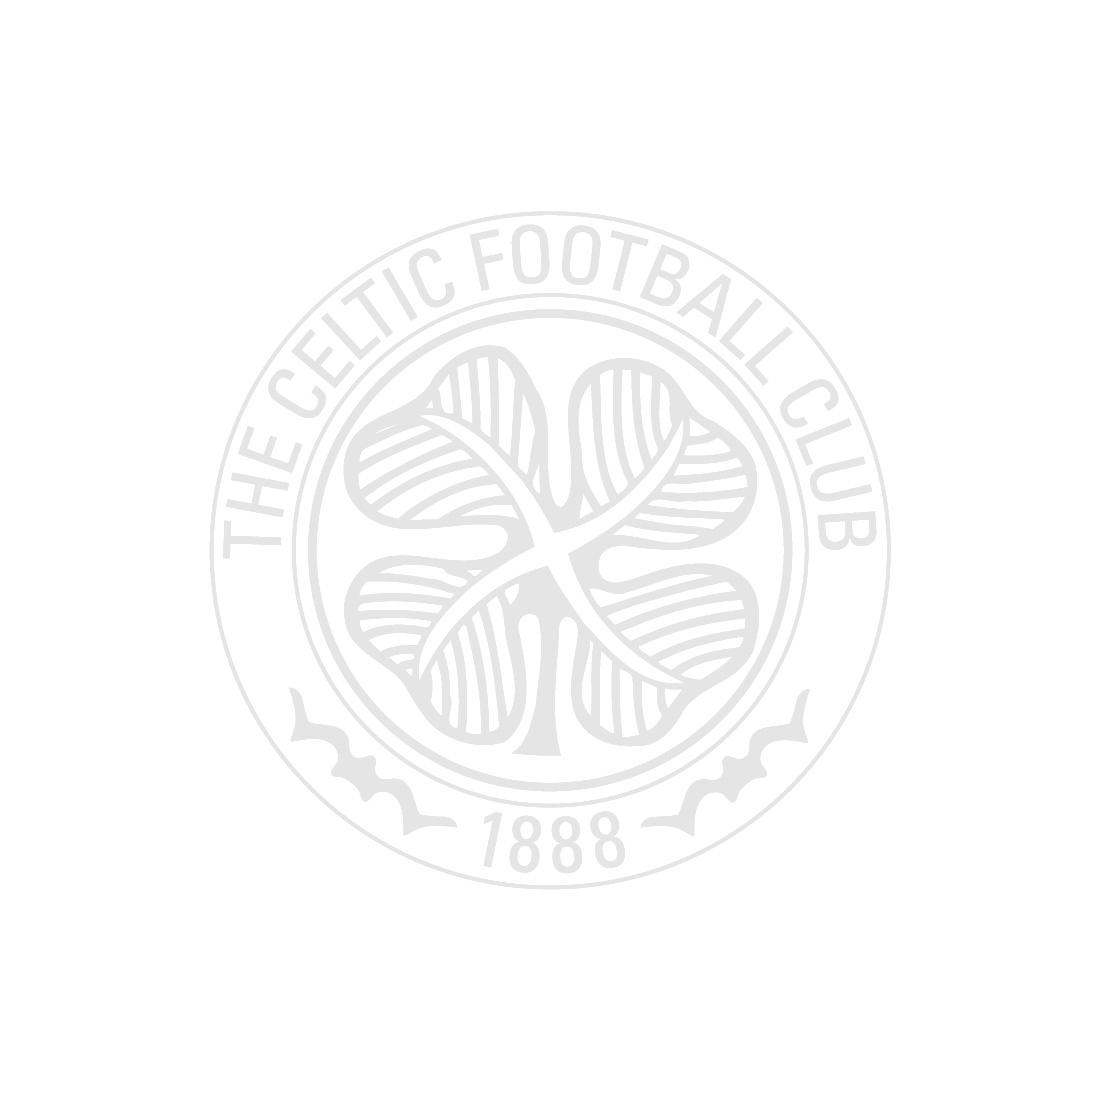 The A-Z of Celtic Football Club DVD